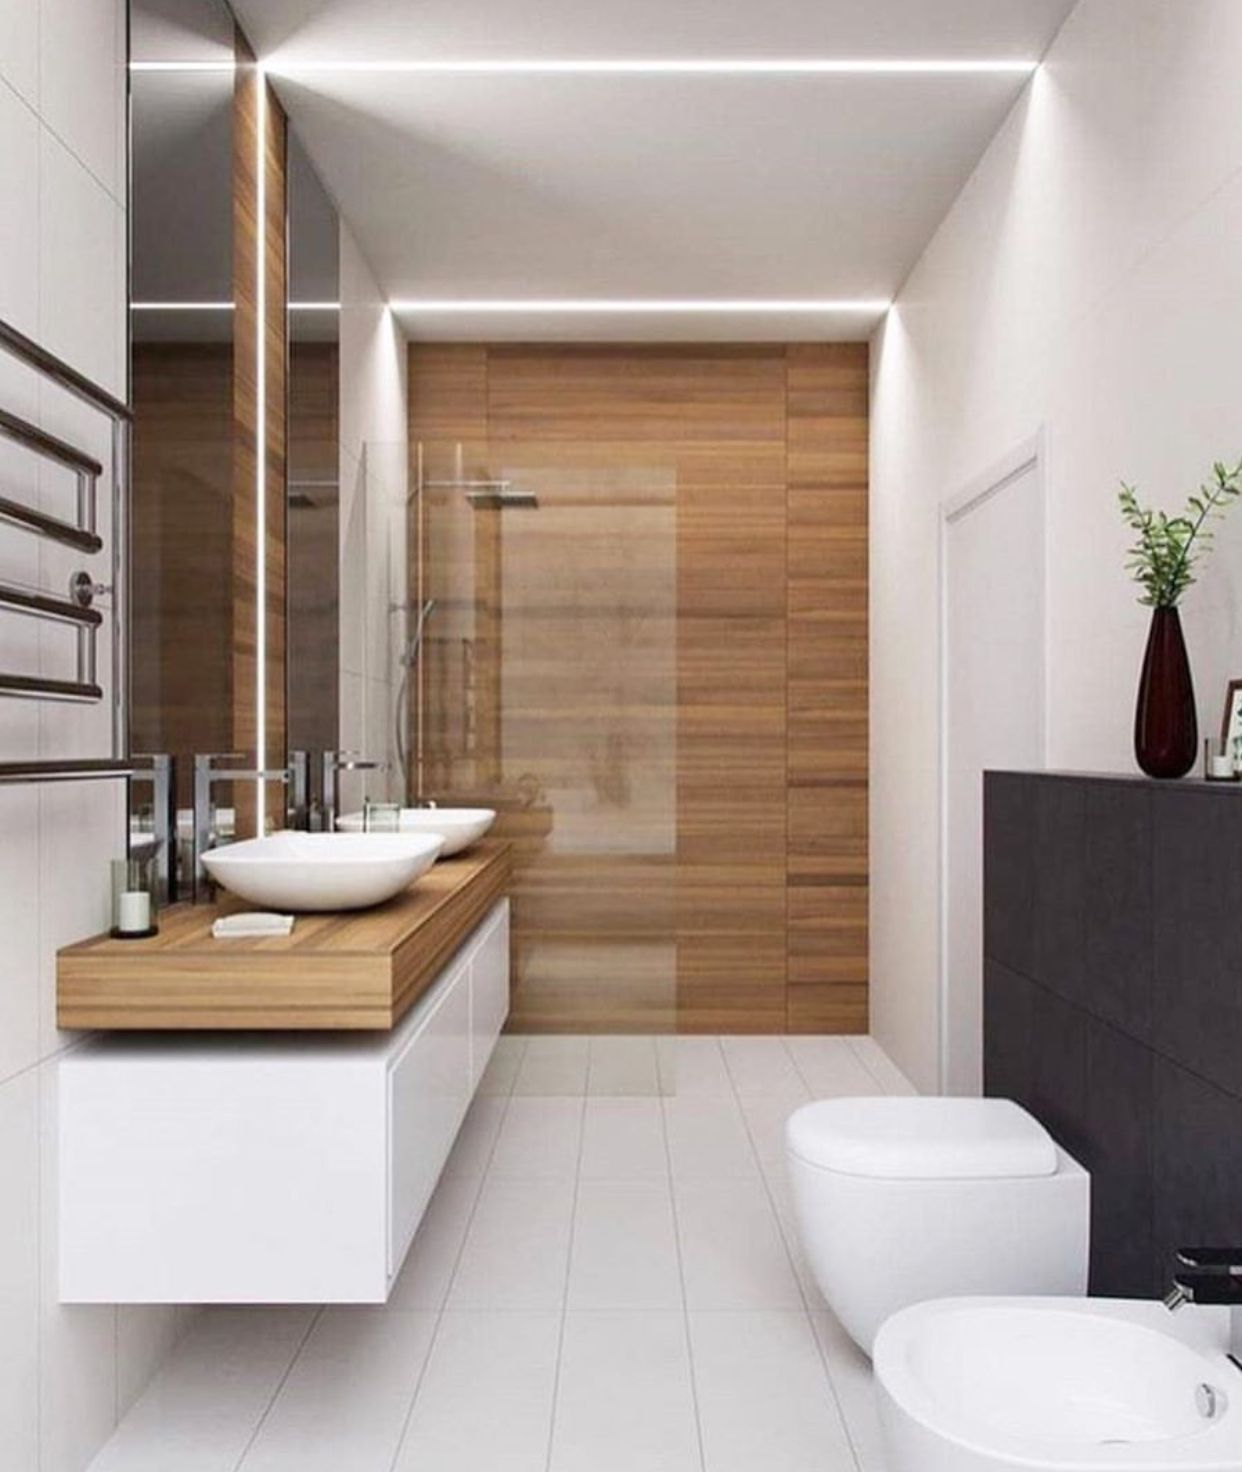 Neue Strickmode 2020 Neue Strickmode Neue In 2020 Bathroom Design Small Small Bathroom Remodel Cost Bathroom Remodel Designs